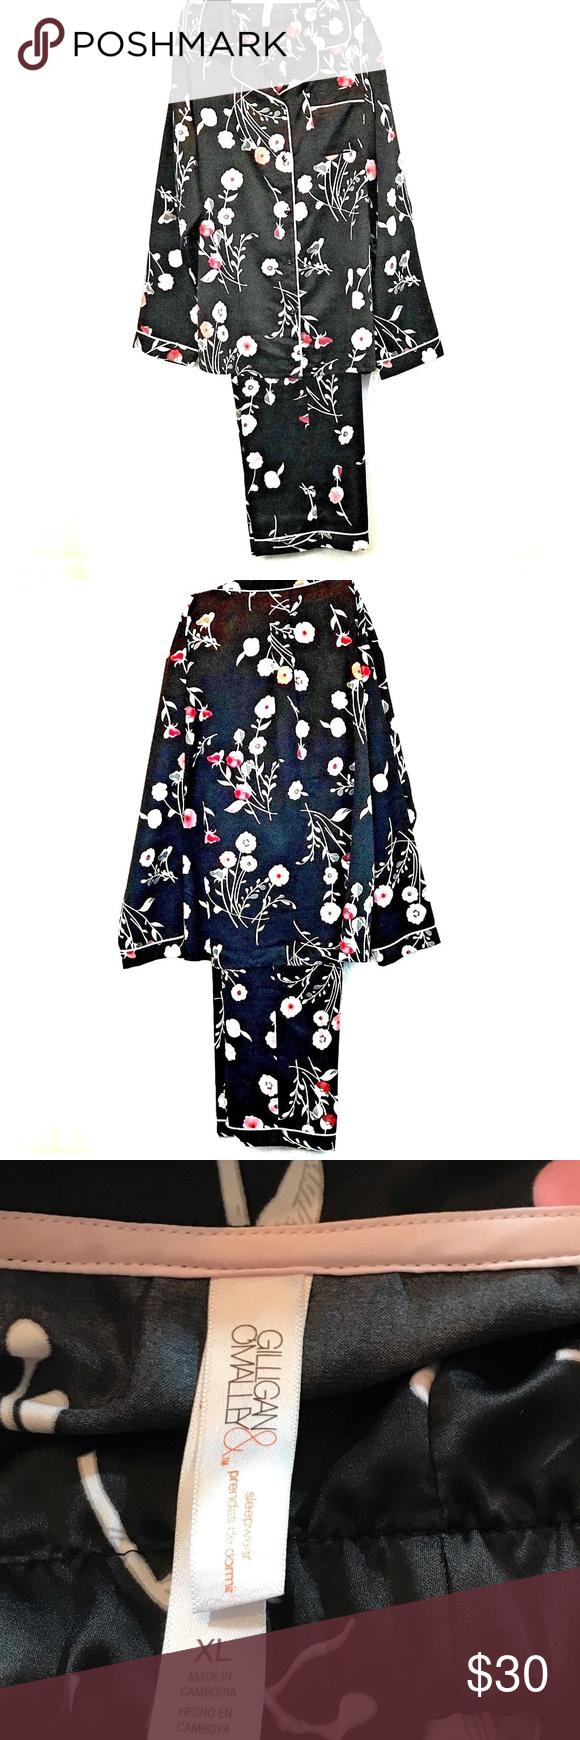 Gilligan O Malley Sleepwear : gilligan, malley, sleepwear, Gilligan, O'Malley, Intimates, Sleepwear, Pajamas, Womens, Pajama, Black, Sleepwear,, Pyjama, Sets,